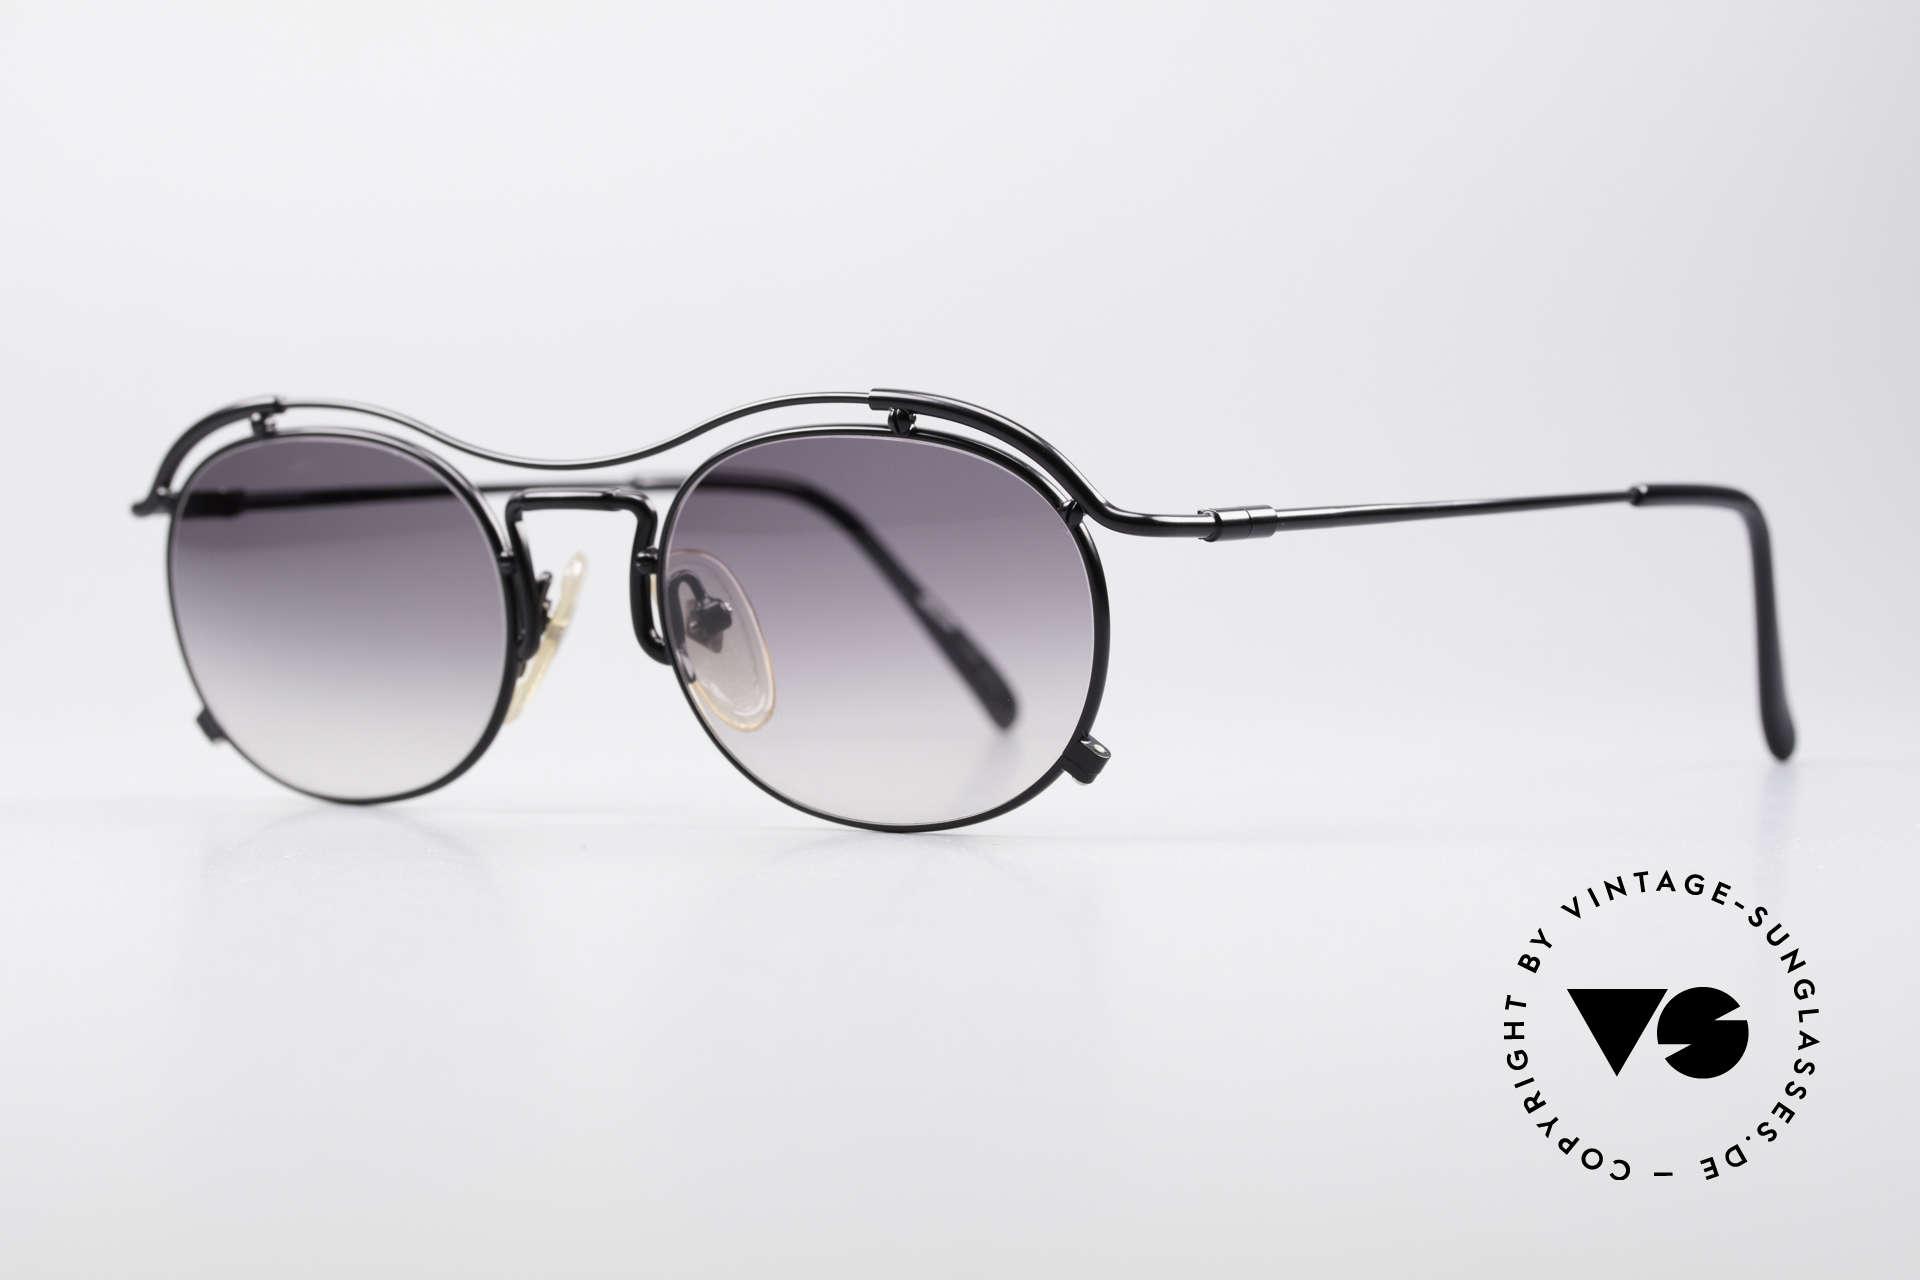 Jean Paul Gaultier 55-2170 Vintage JPG Sunglasses, black finish and noble gray-gradient sun lenses, Made for Men and Women